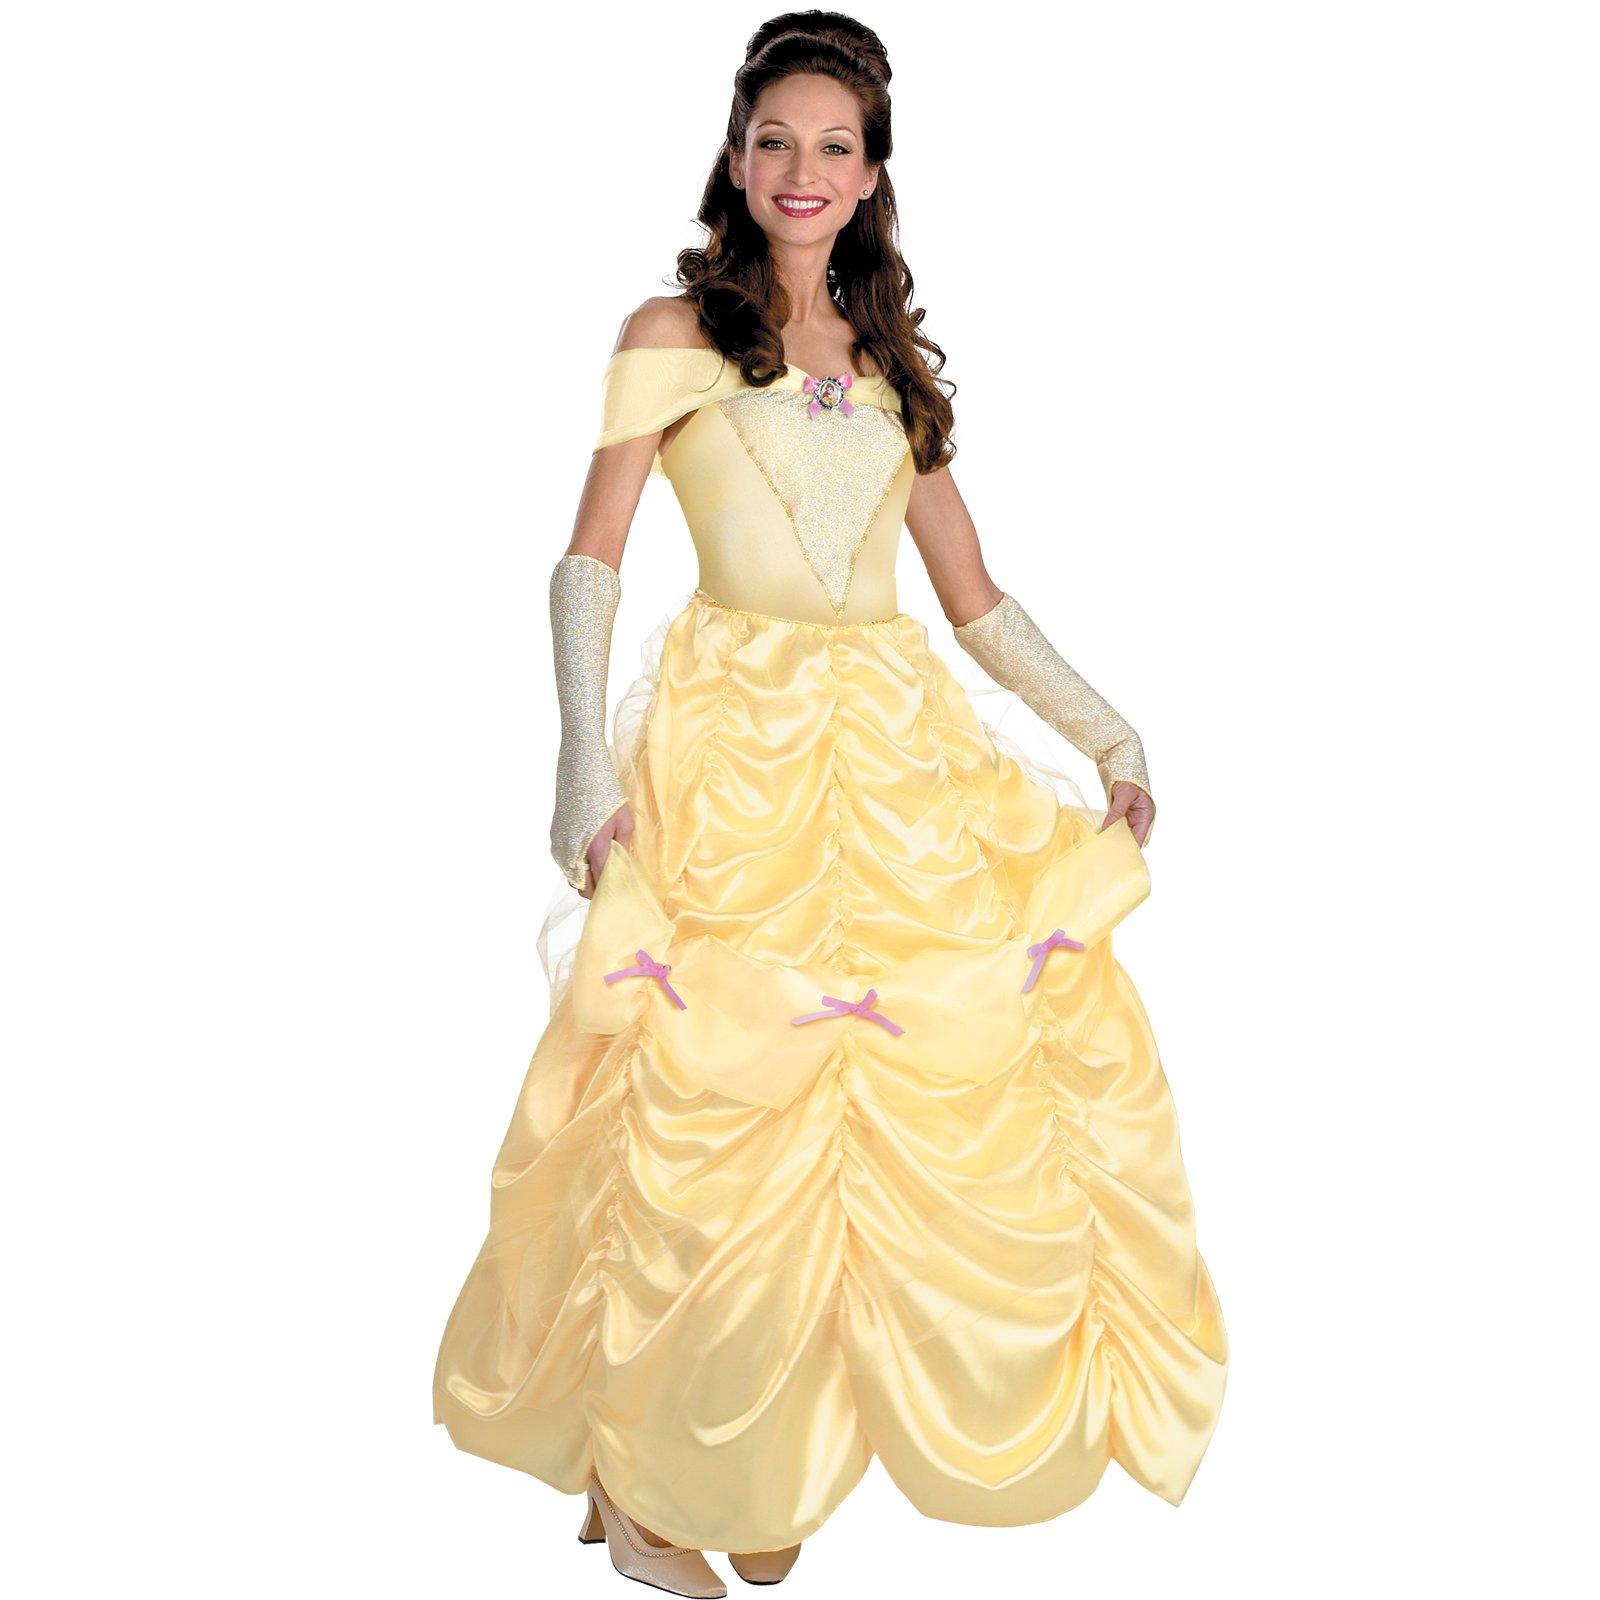 Belle  sc 1 st  Meningrey & Belle Costume Beauty And The Beast - Meningrey